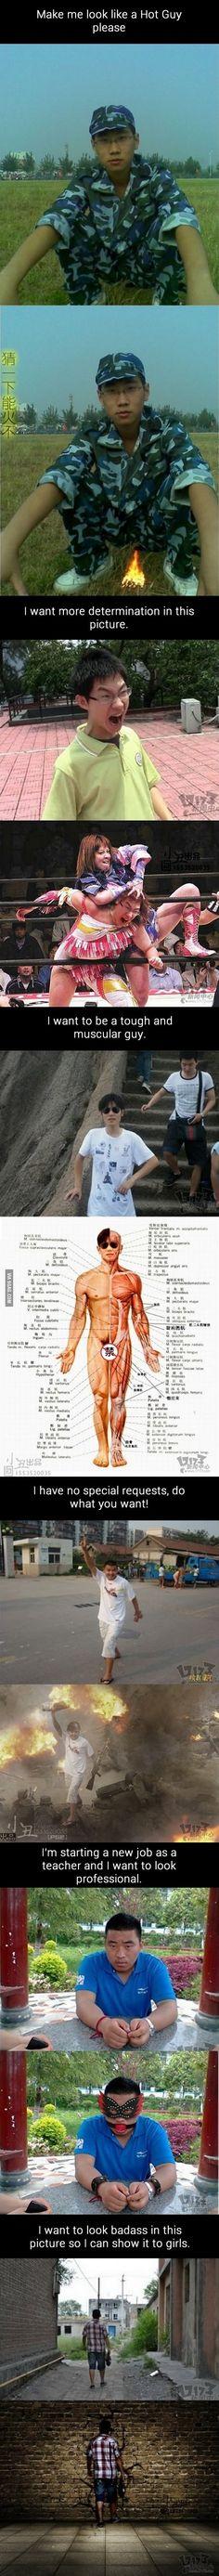 Asian Photoshop Troll